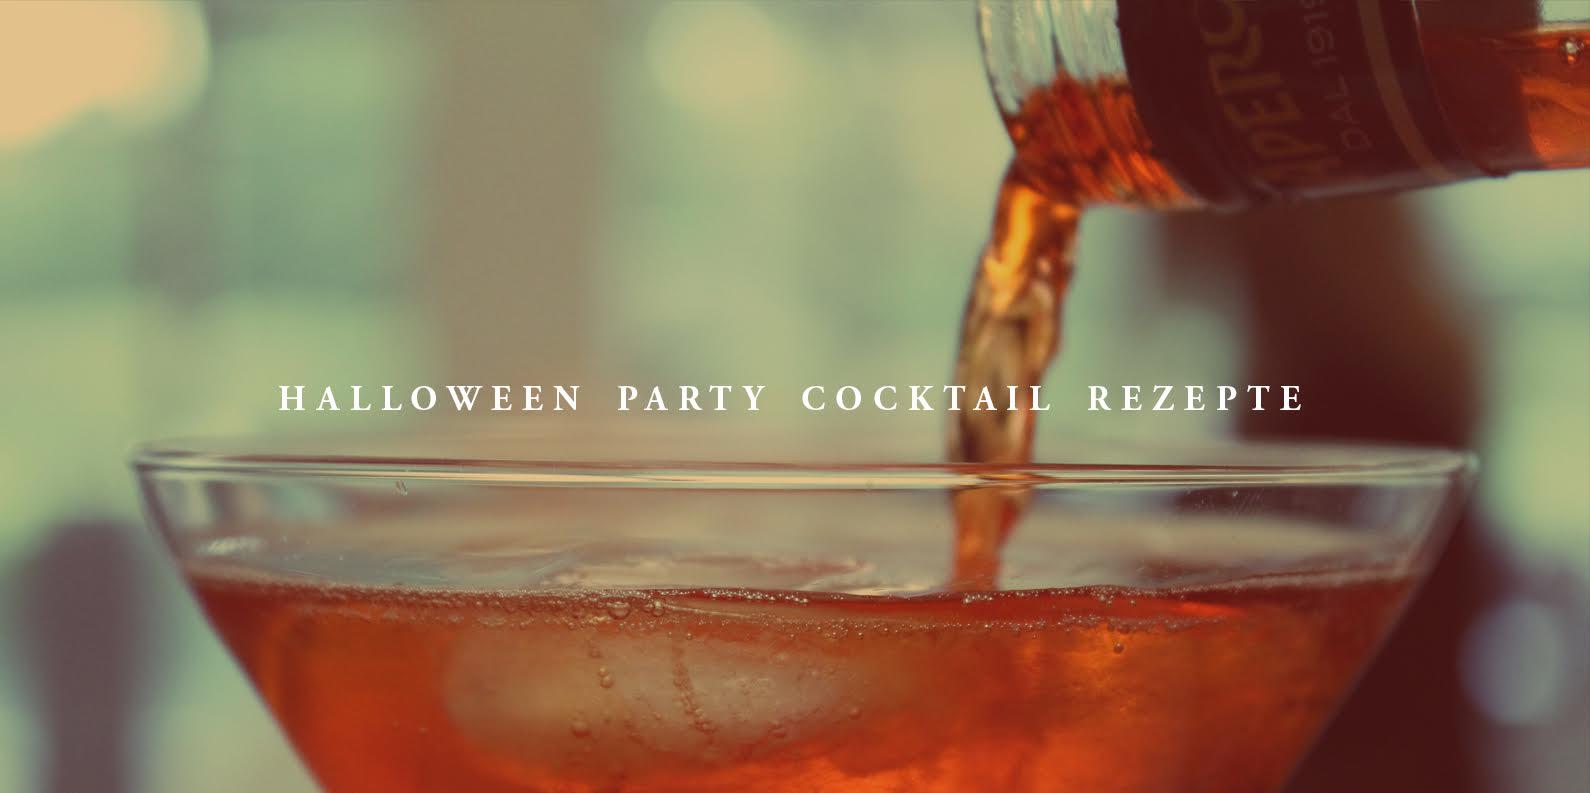 Halloween-Party-Cocktail-Rezept